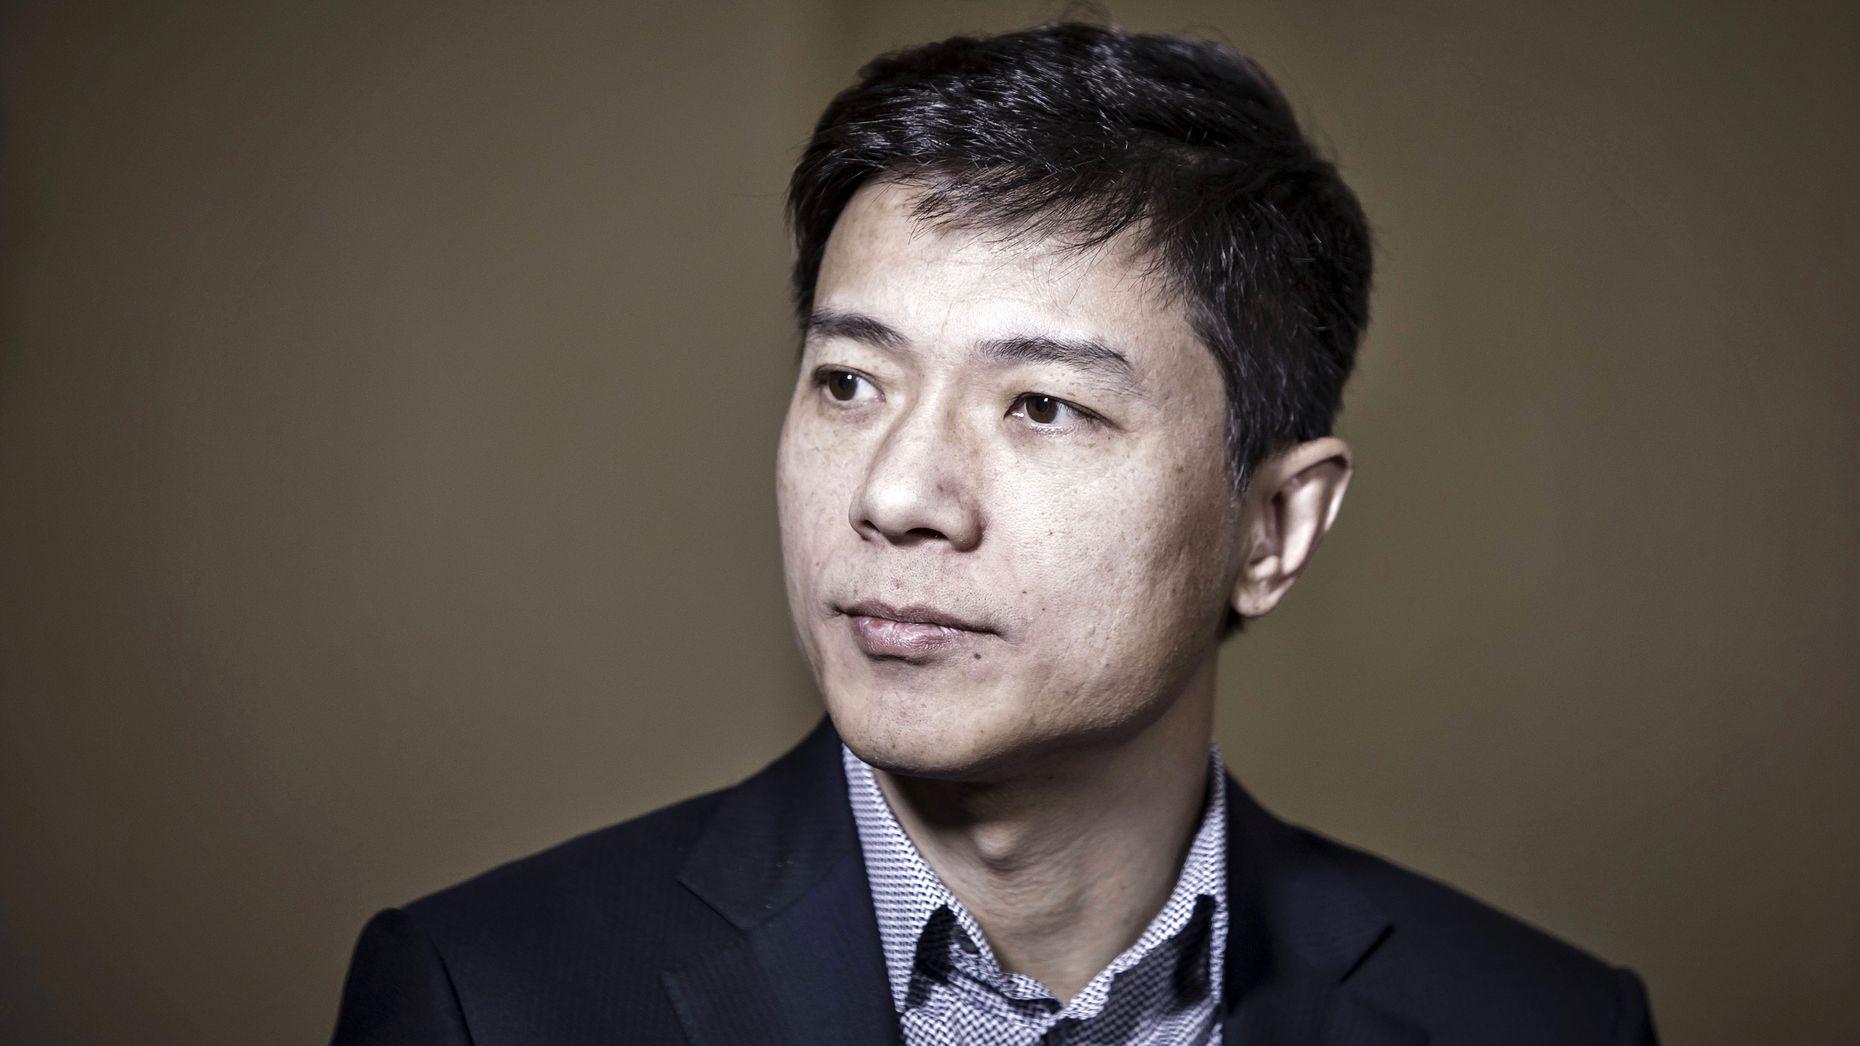 Baidu CEO Robin Li. Photo by Bloomberg.